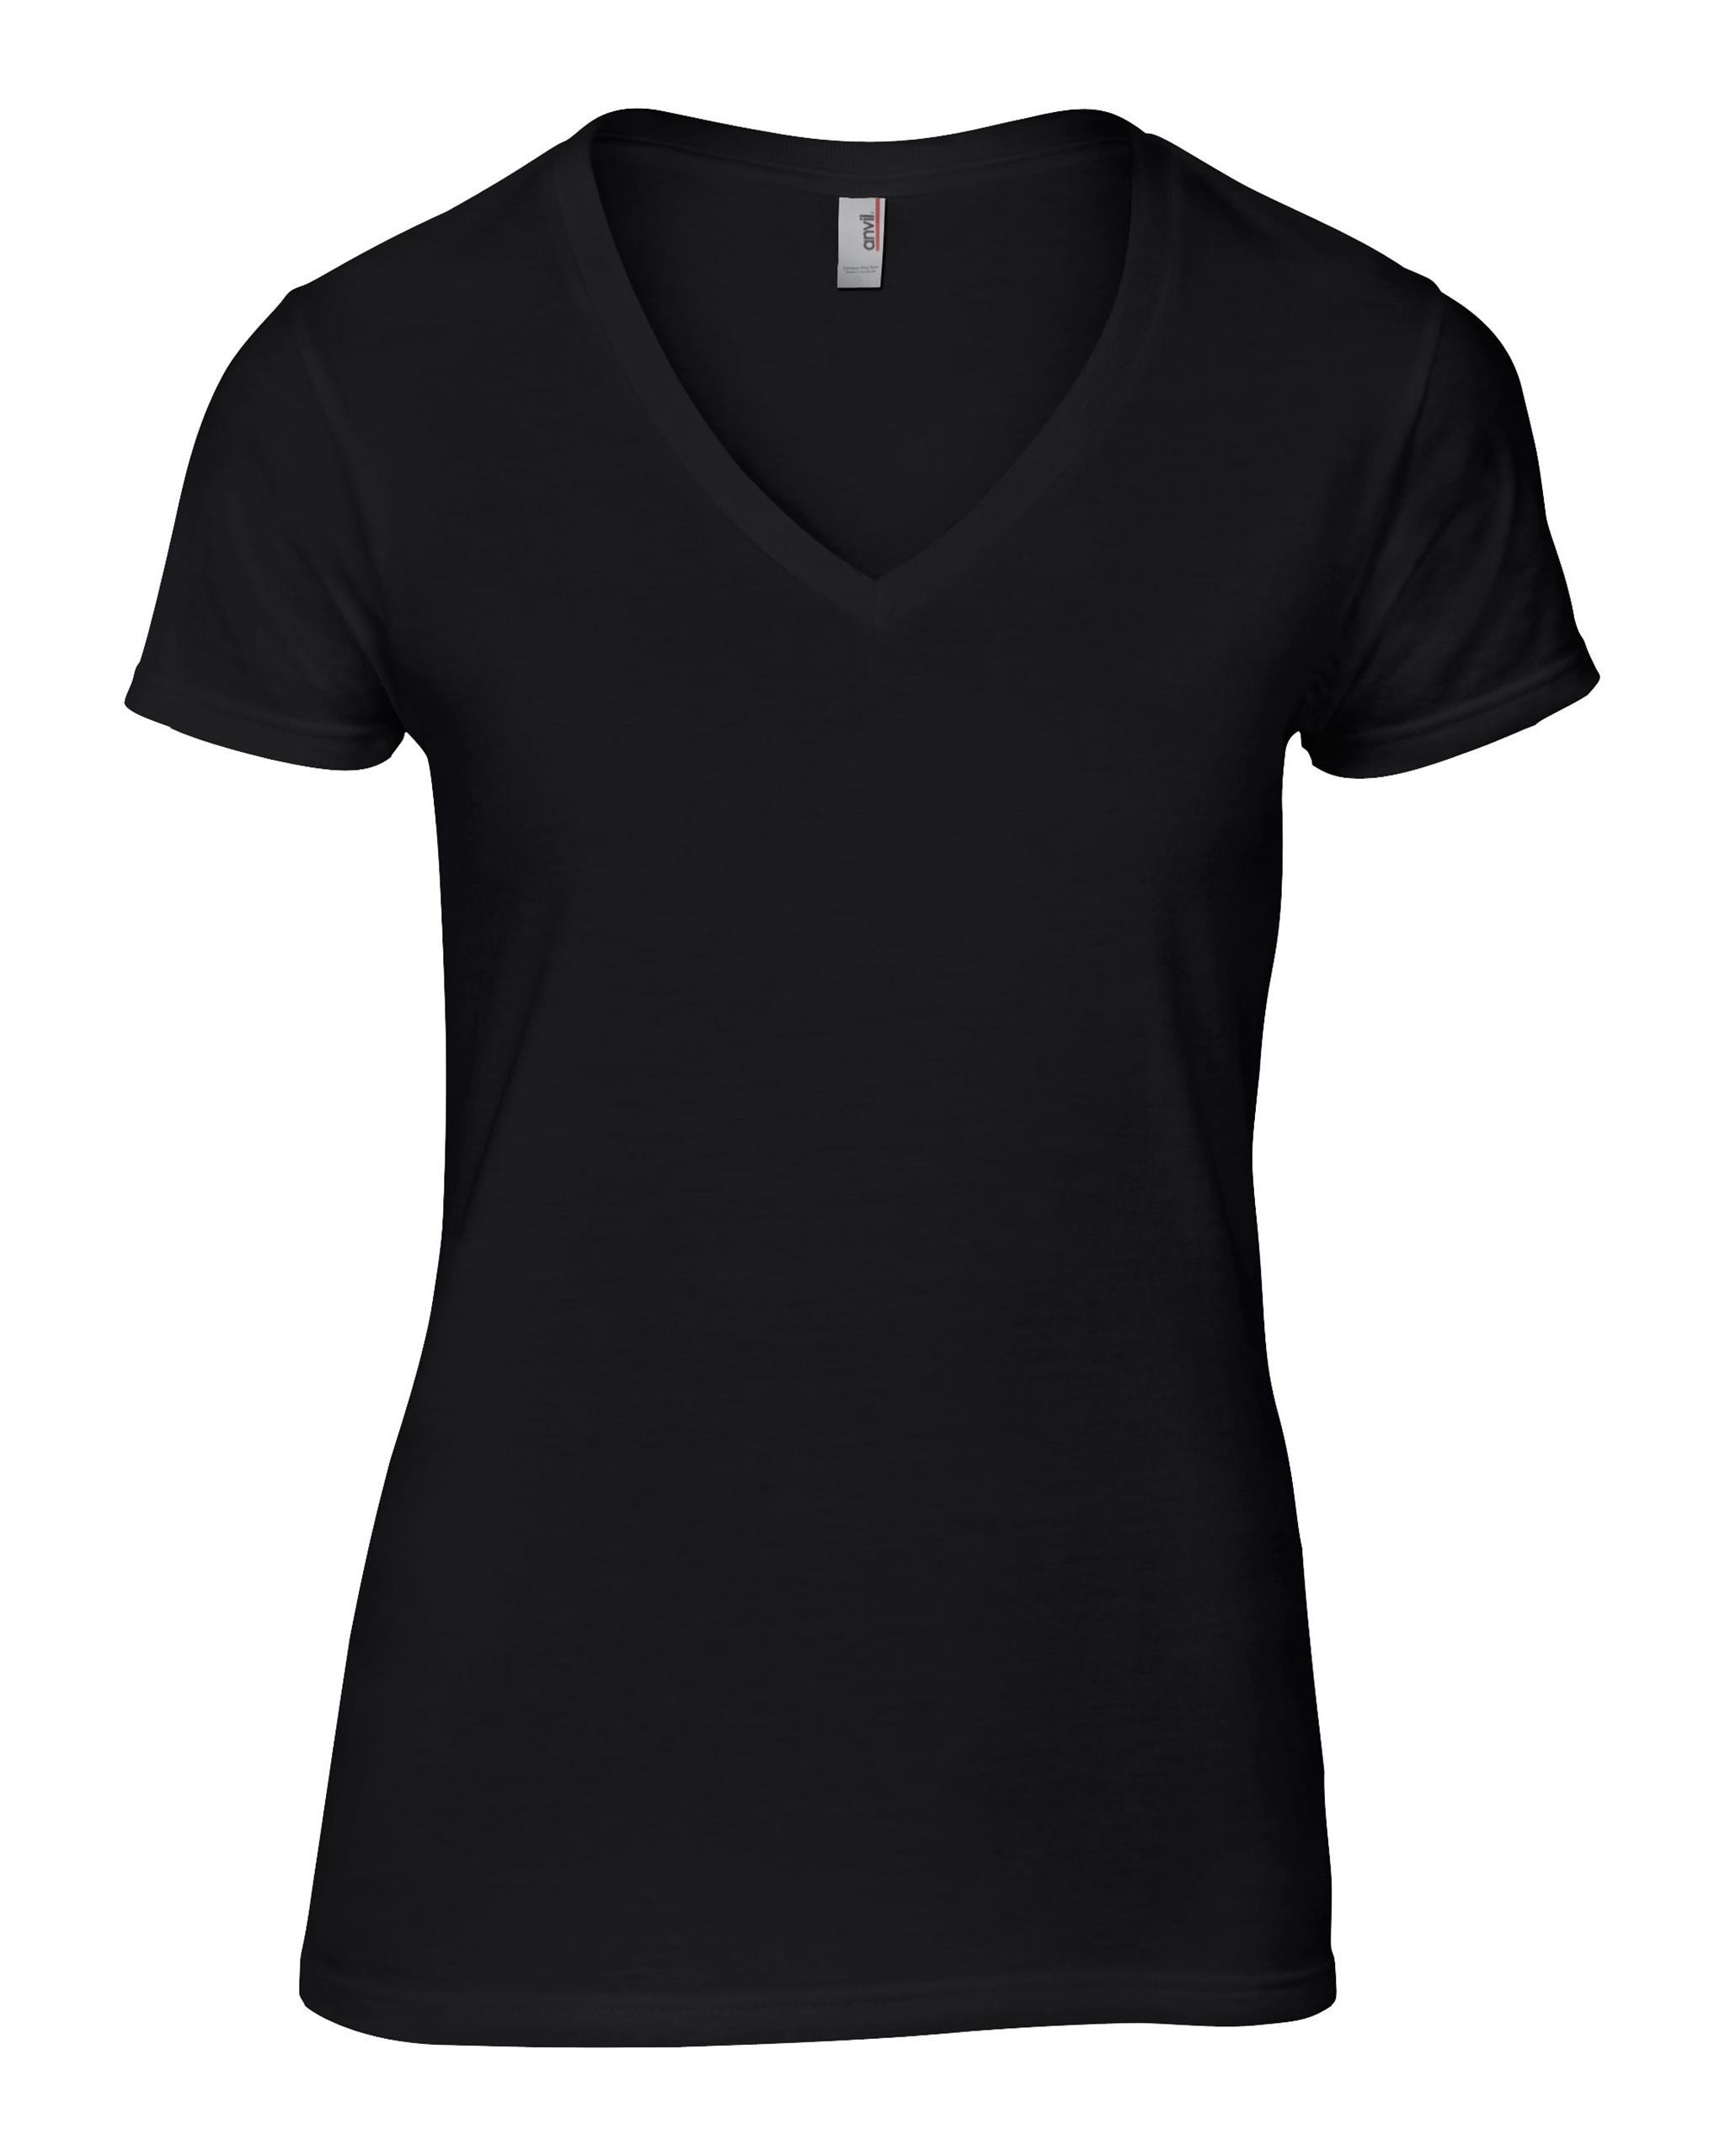 64d75811d26 Anvil Womens V Neck Tee Ladies Short Sleeved Basic T-shirt Top Size ...